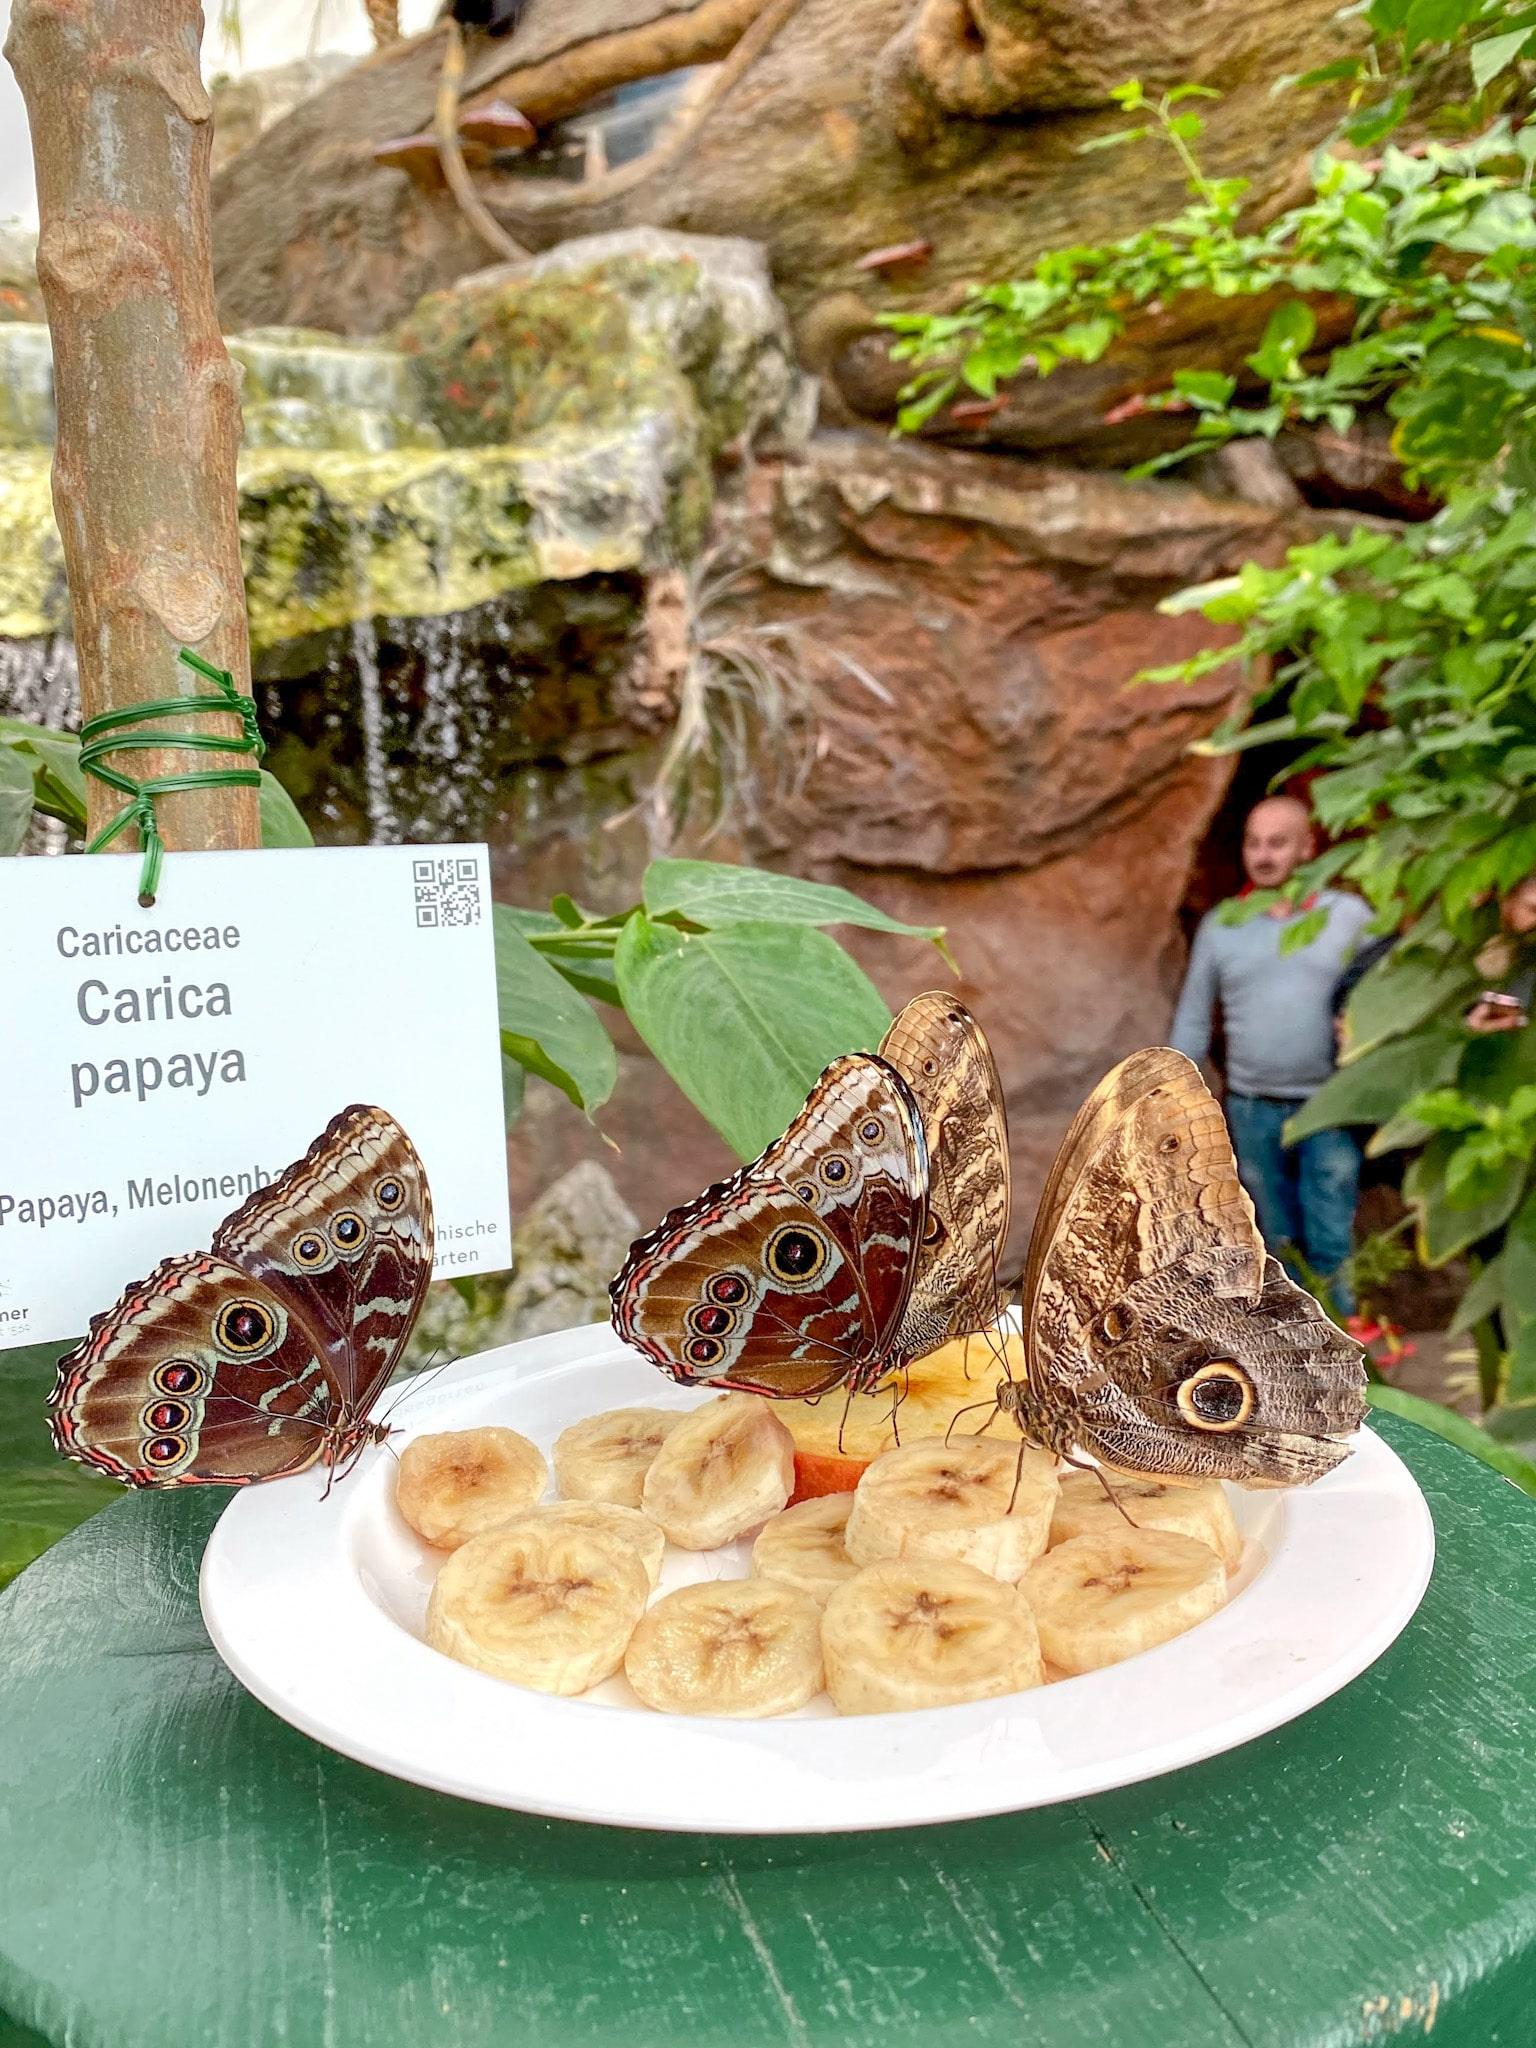 The Butterfly House (Schmetterlinghaus) in Vienna, Austria.